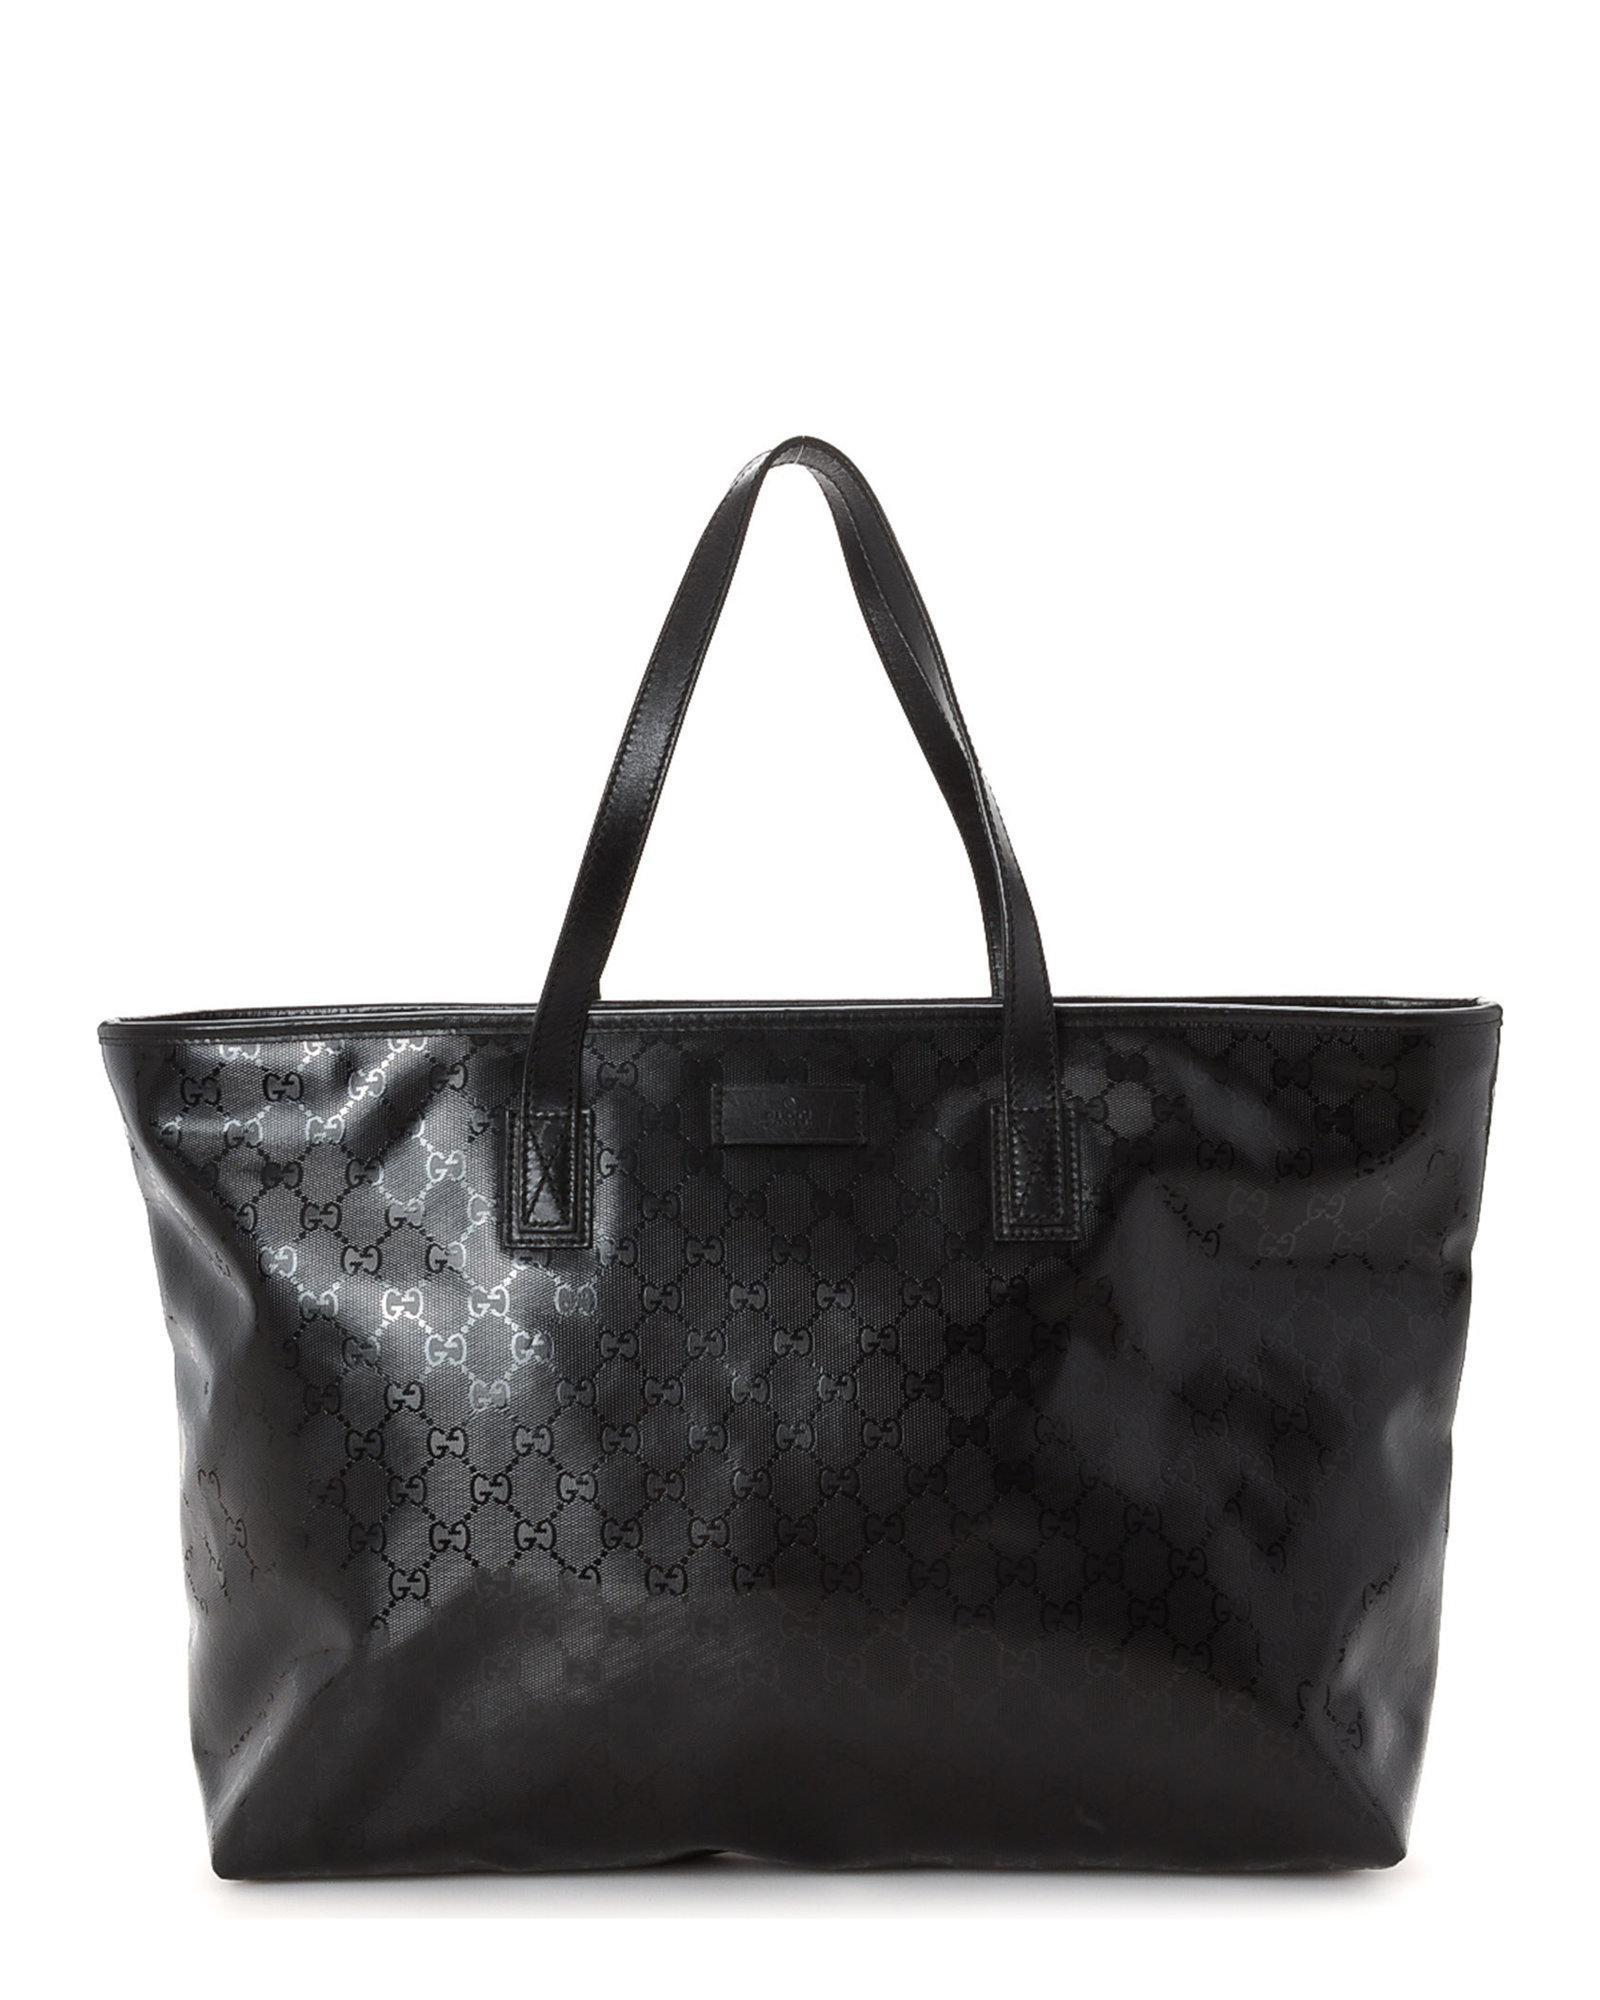 29b11763b163 Gucci Gg Imprime Tote - Vintage in Black - Lyst